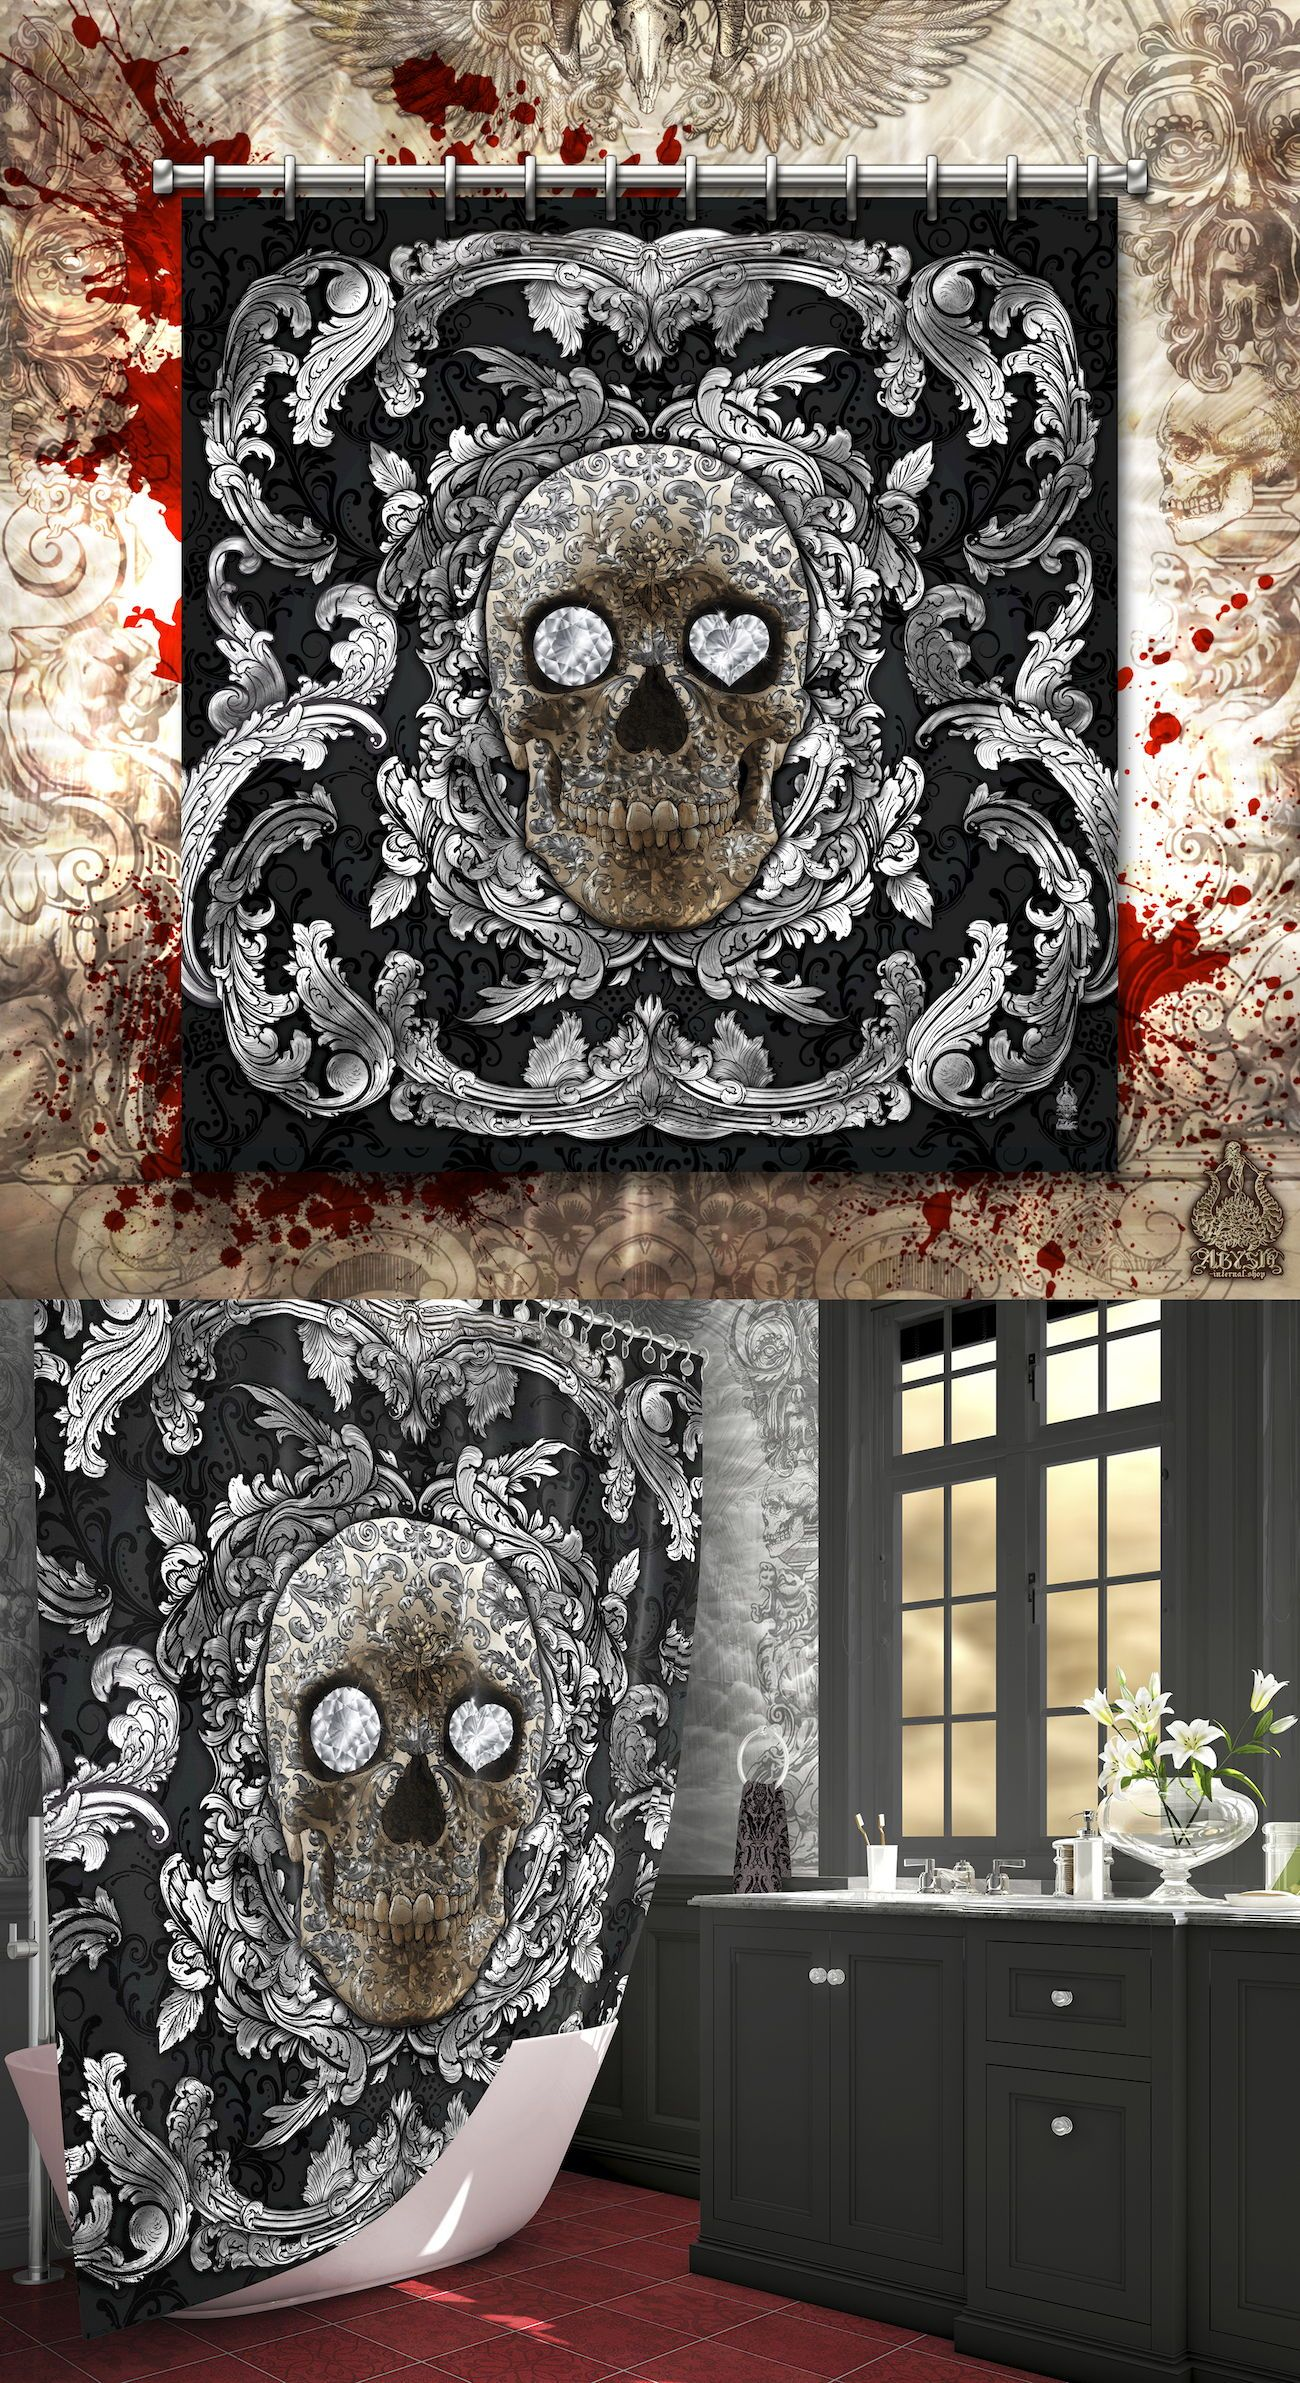 Gothic Silver Sugar Skull Shower Curtain Home Decor